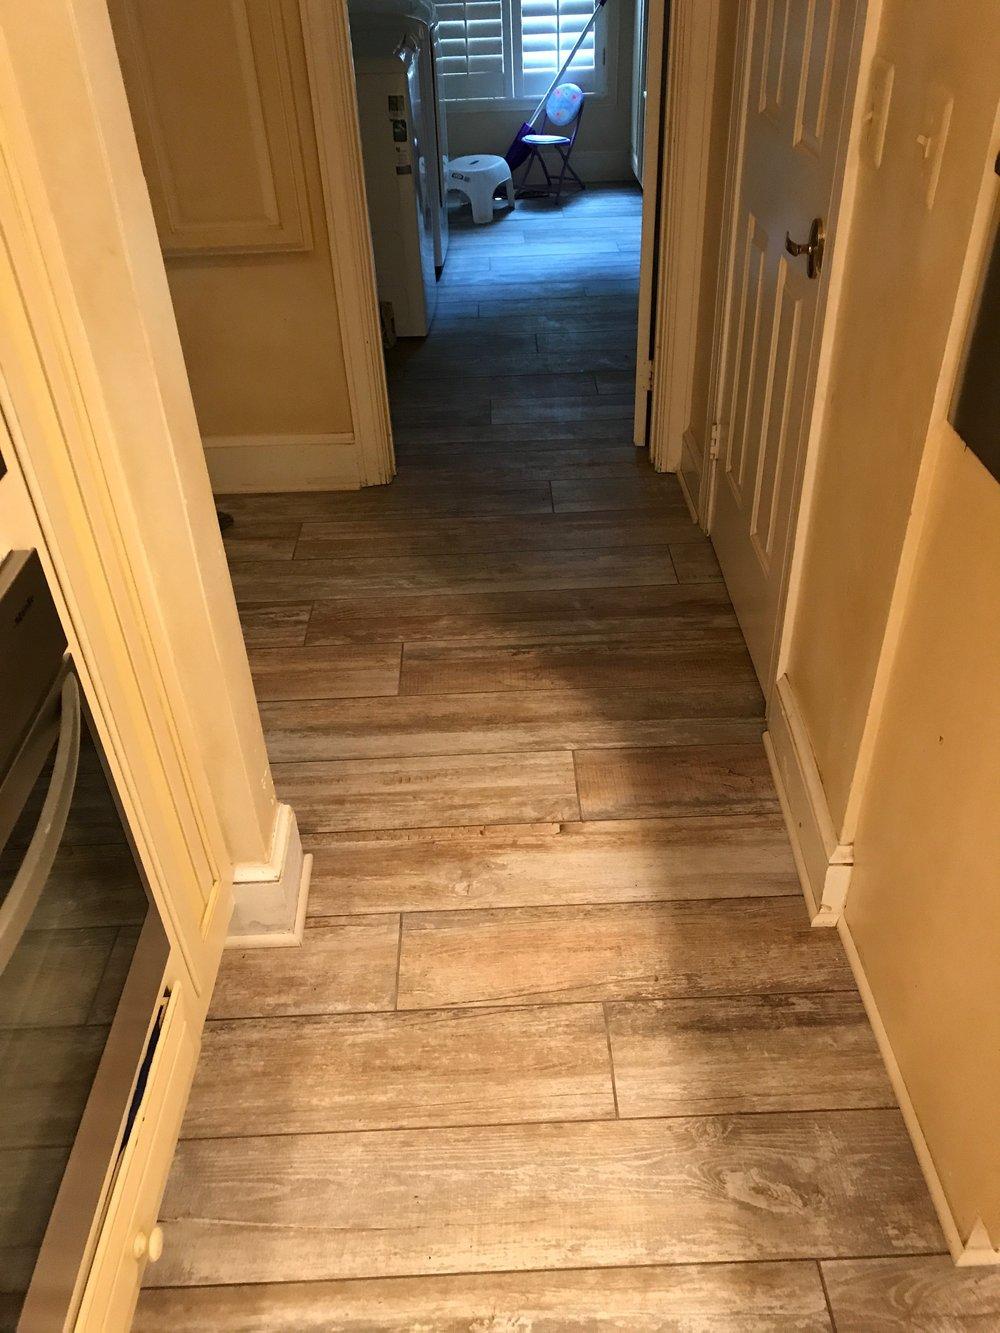 oakton+kitchen+tile+floor+after+3.JPG